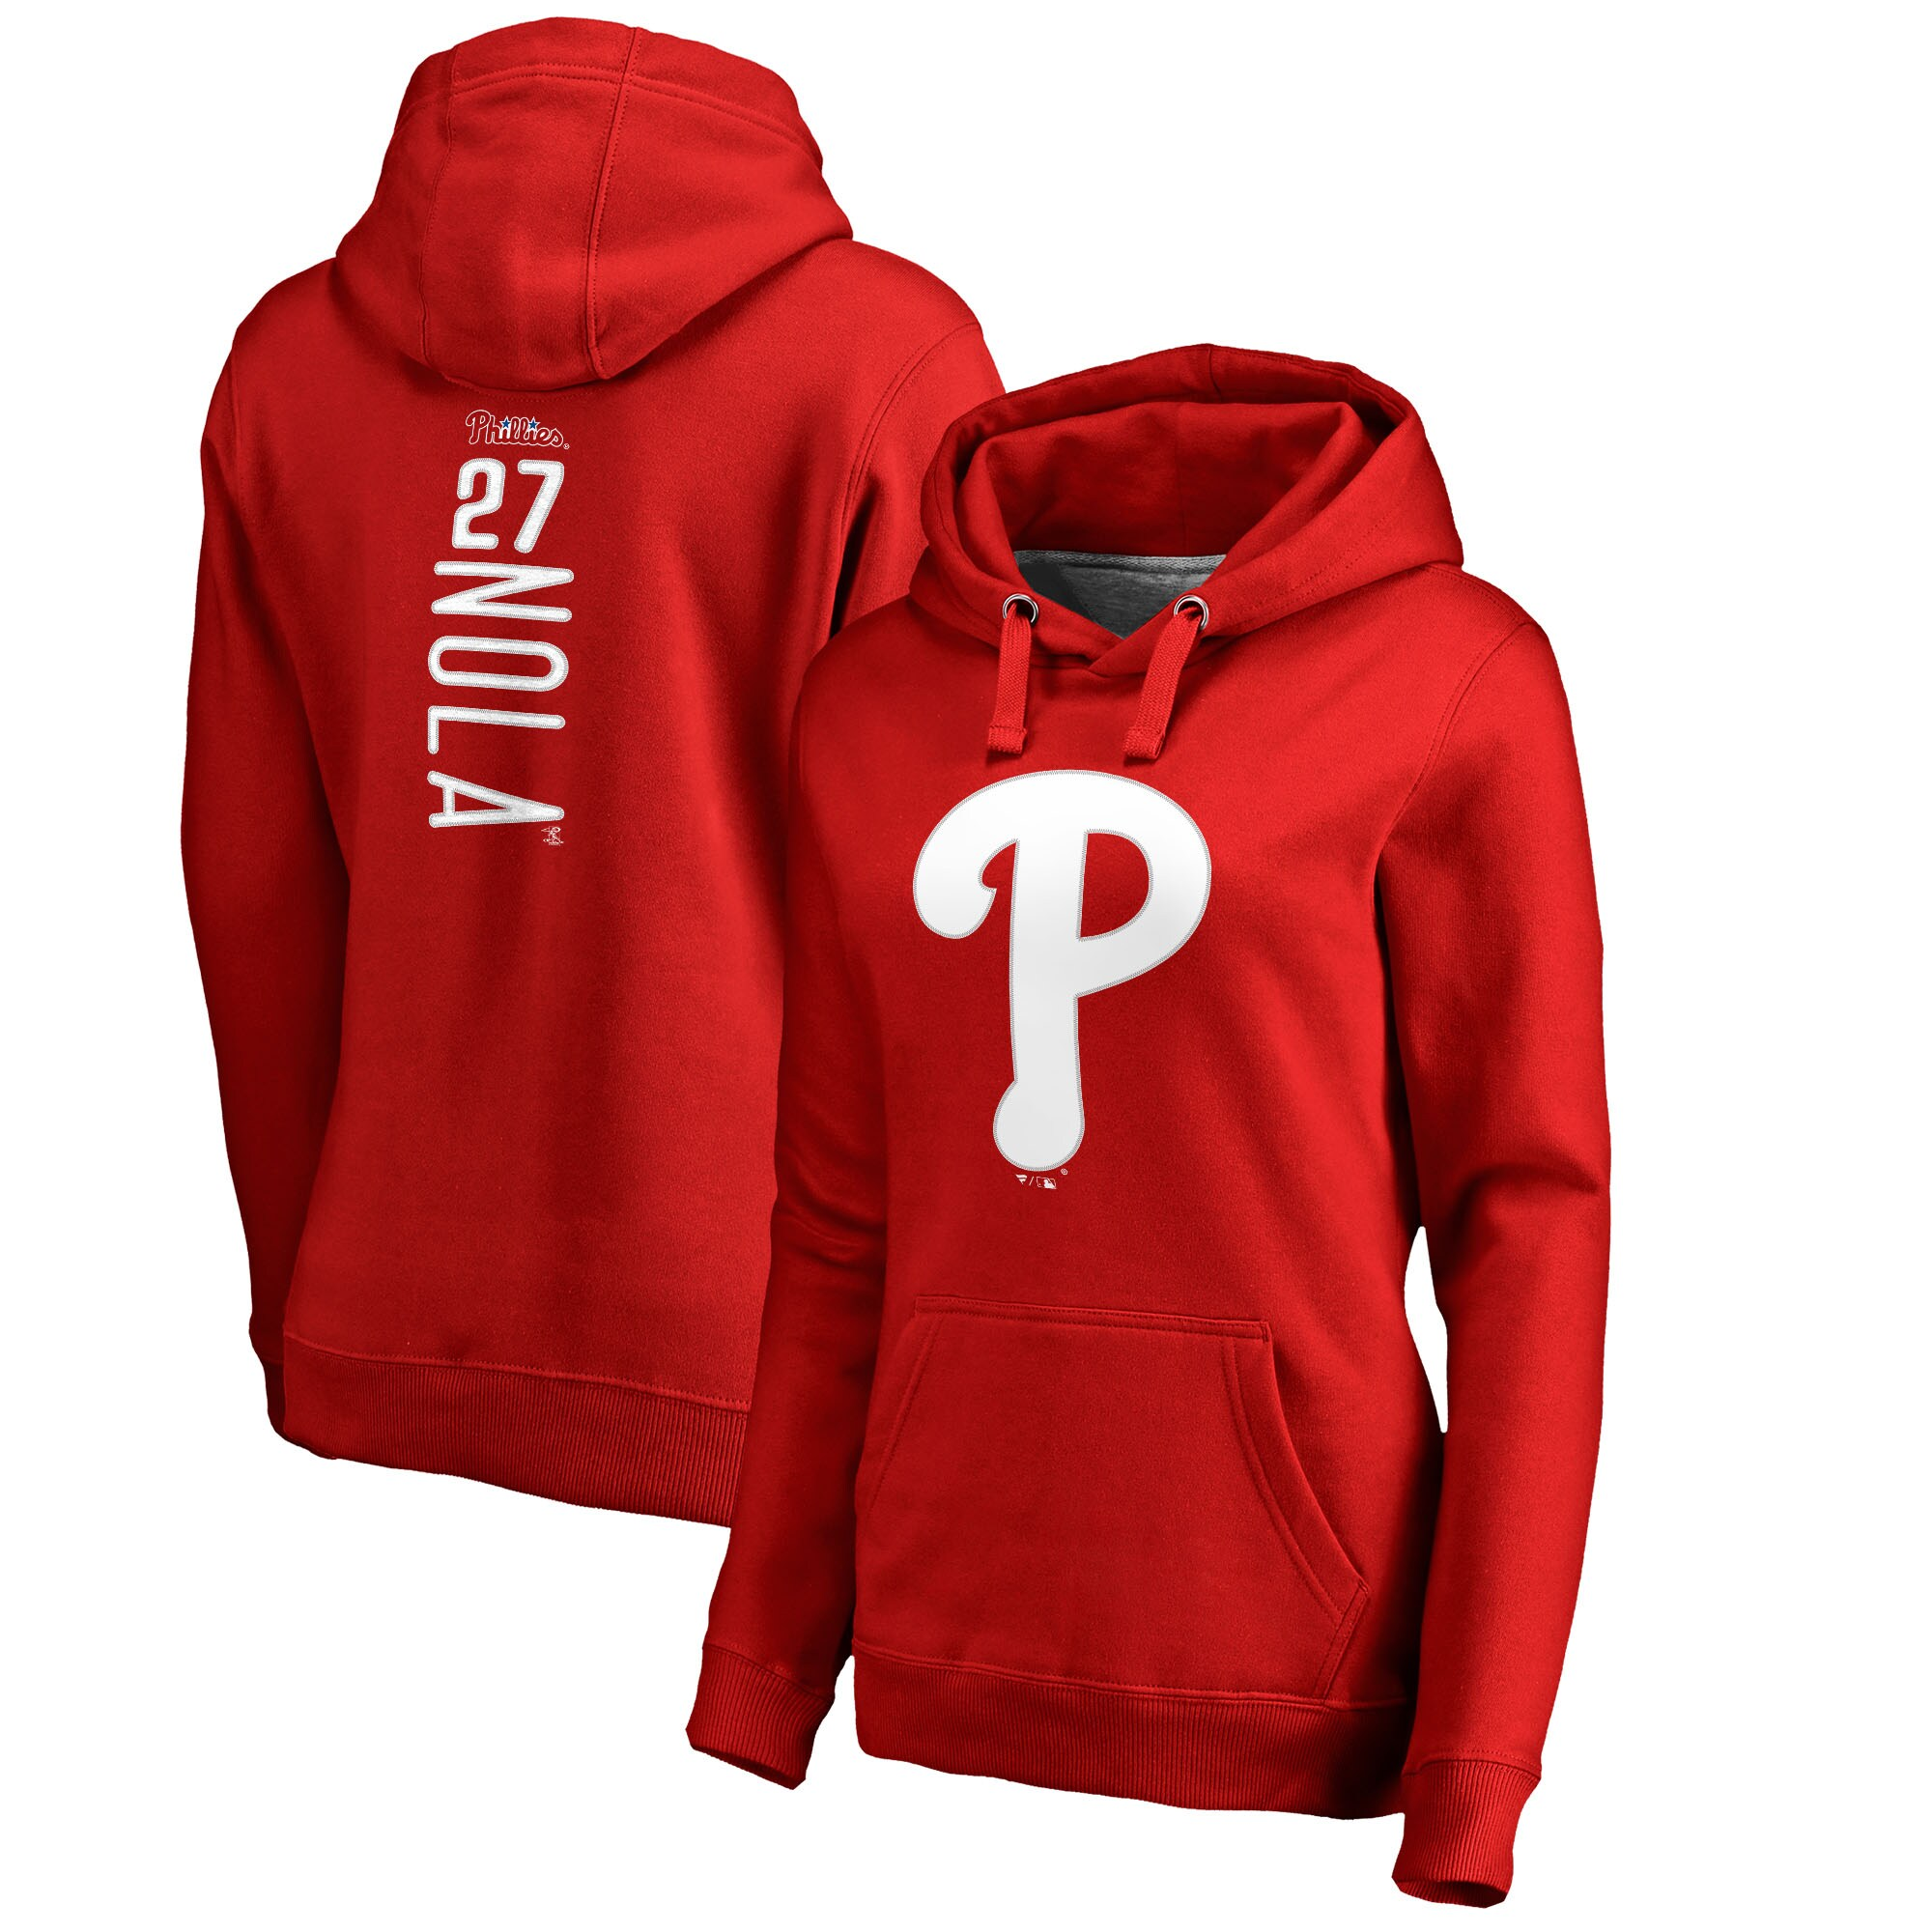 Aaron Nola Philadelphia Phillies Fanatics Branded Women's Backer Pullover Hoodie - Red